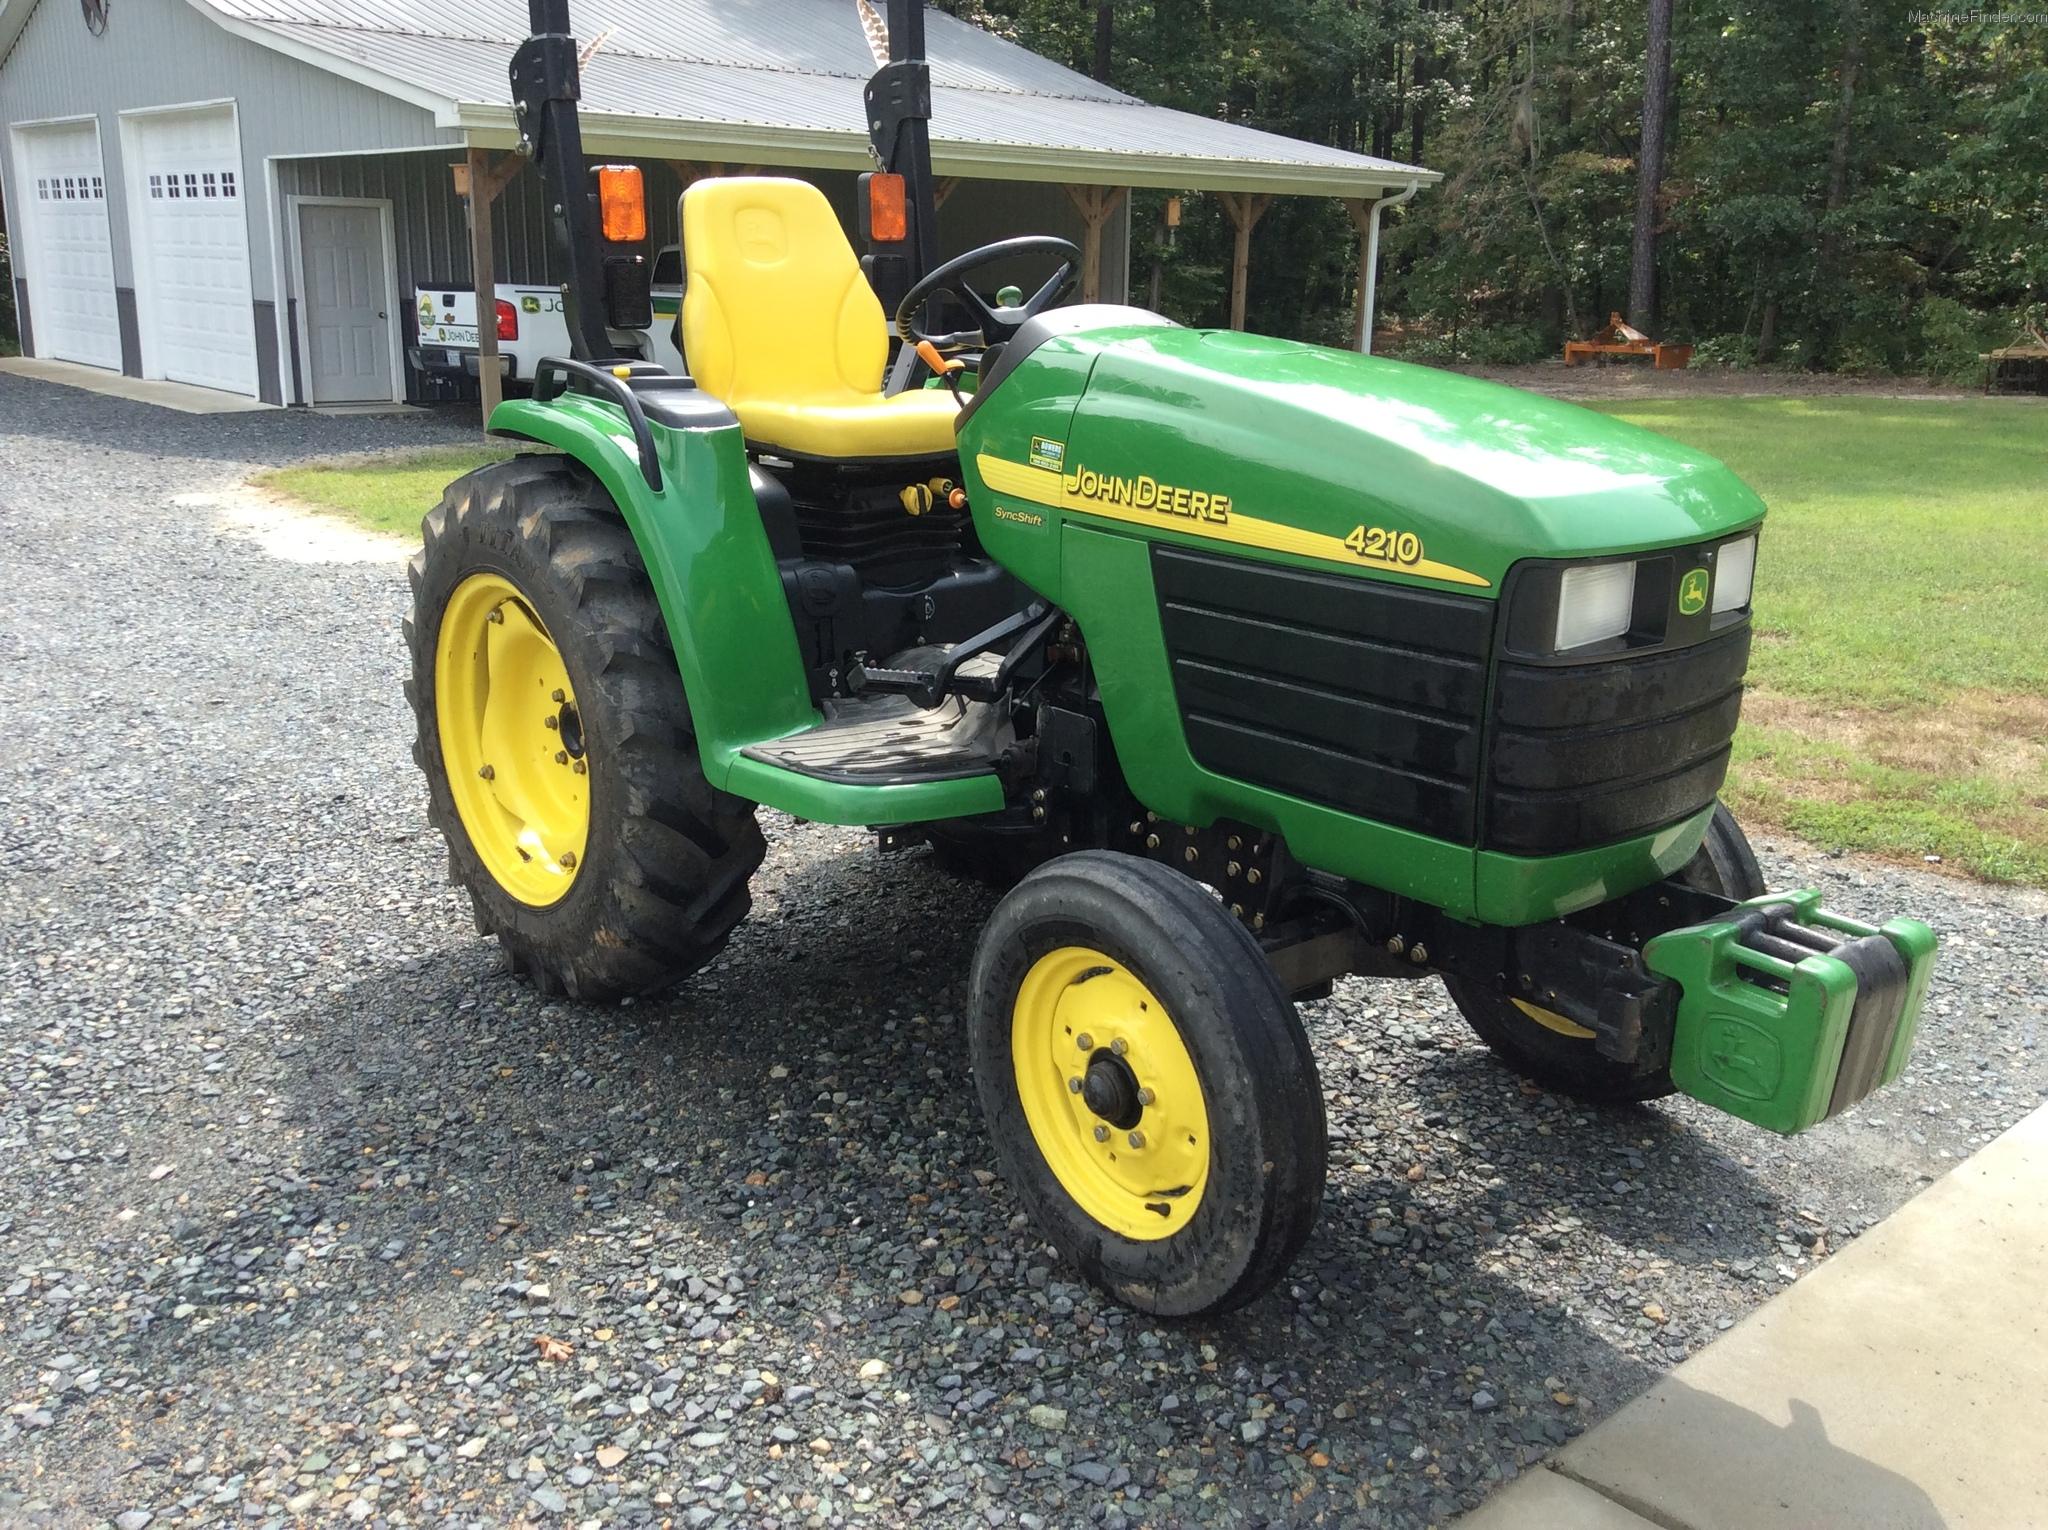 2003 John Deere 4210 Tractors - Compact (1-40hp.) - John ...